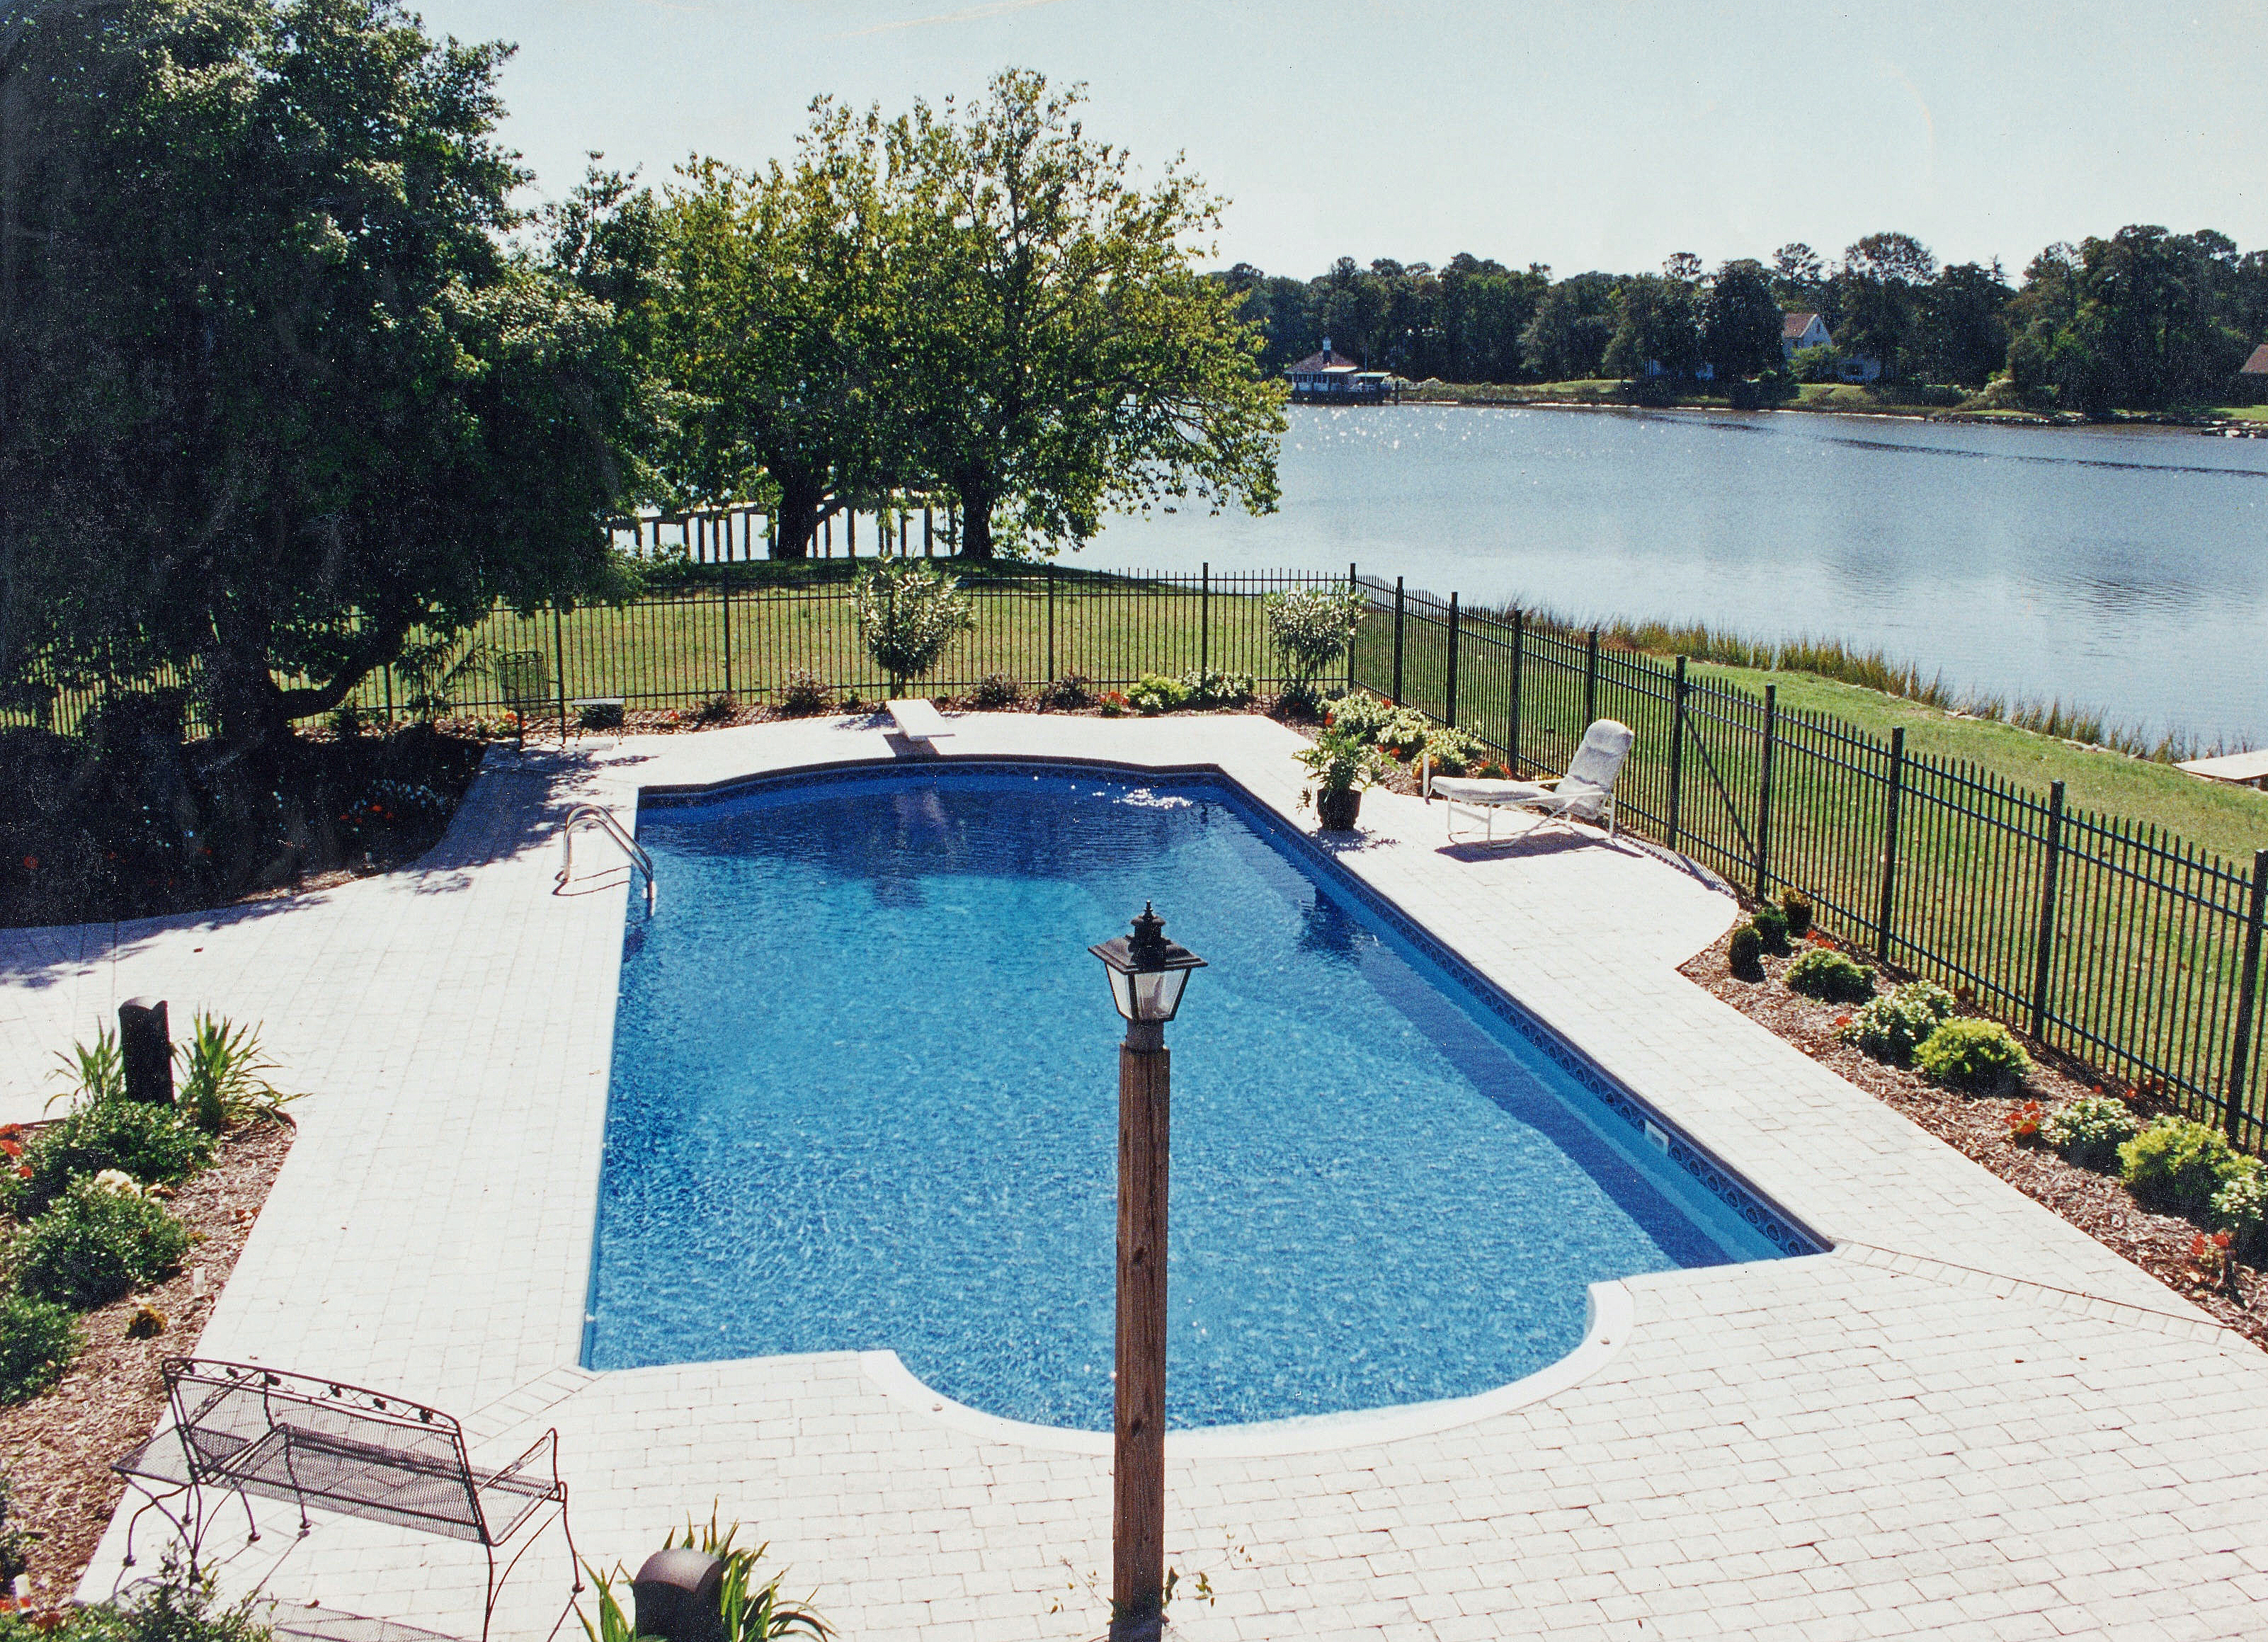 Roman liner pool 4